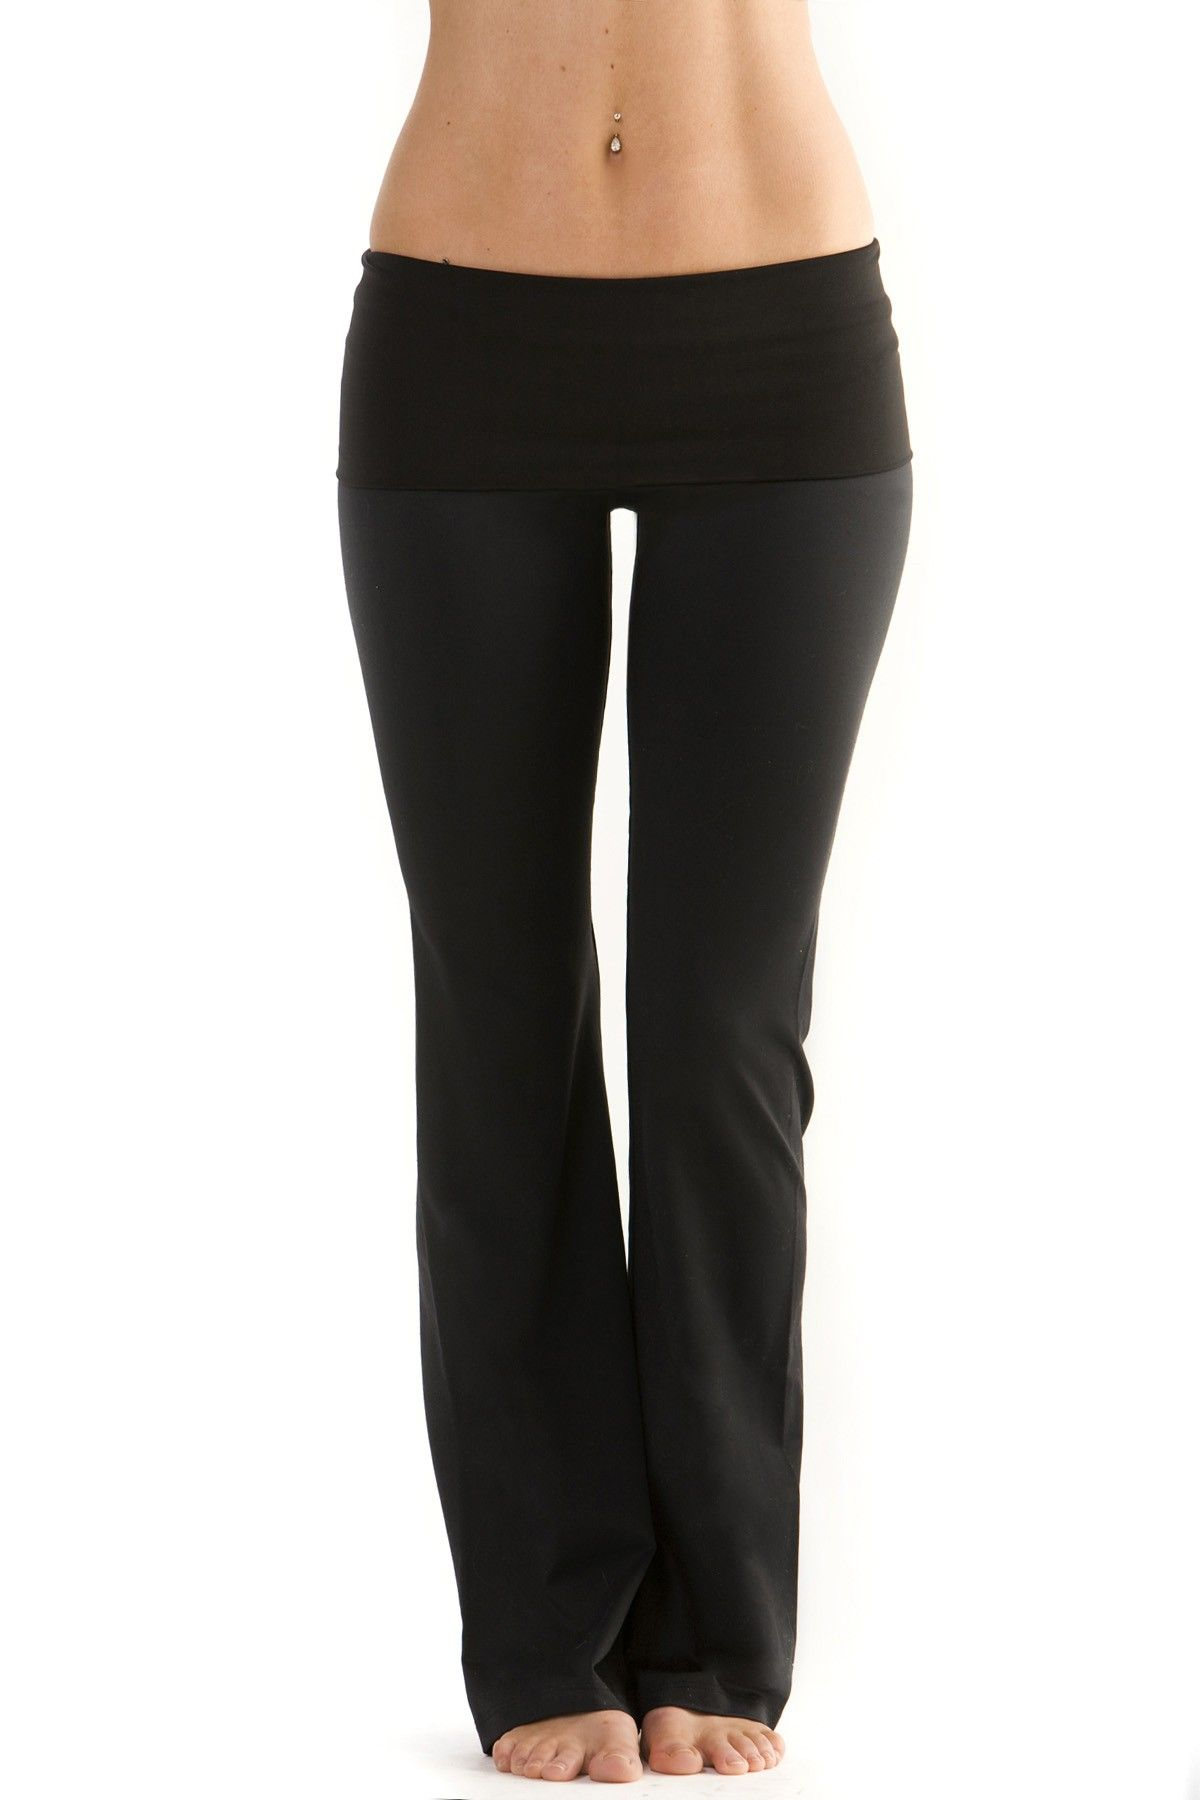 black yoga pants - Google Search | amaya | Pinterest | Acts 1 ...